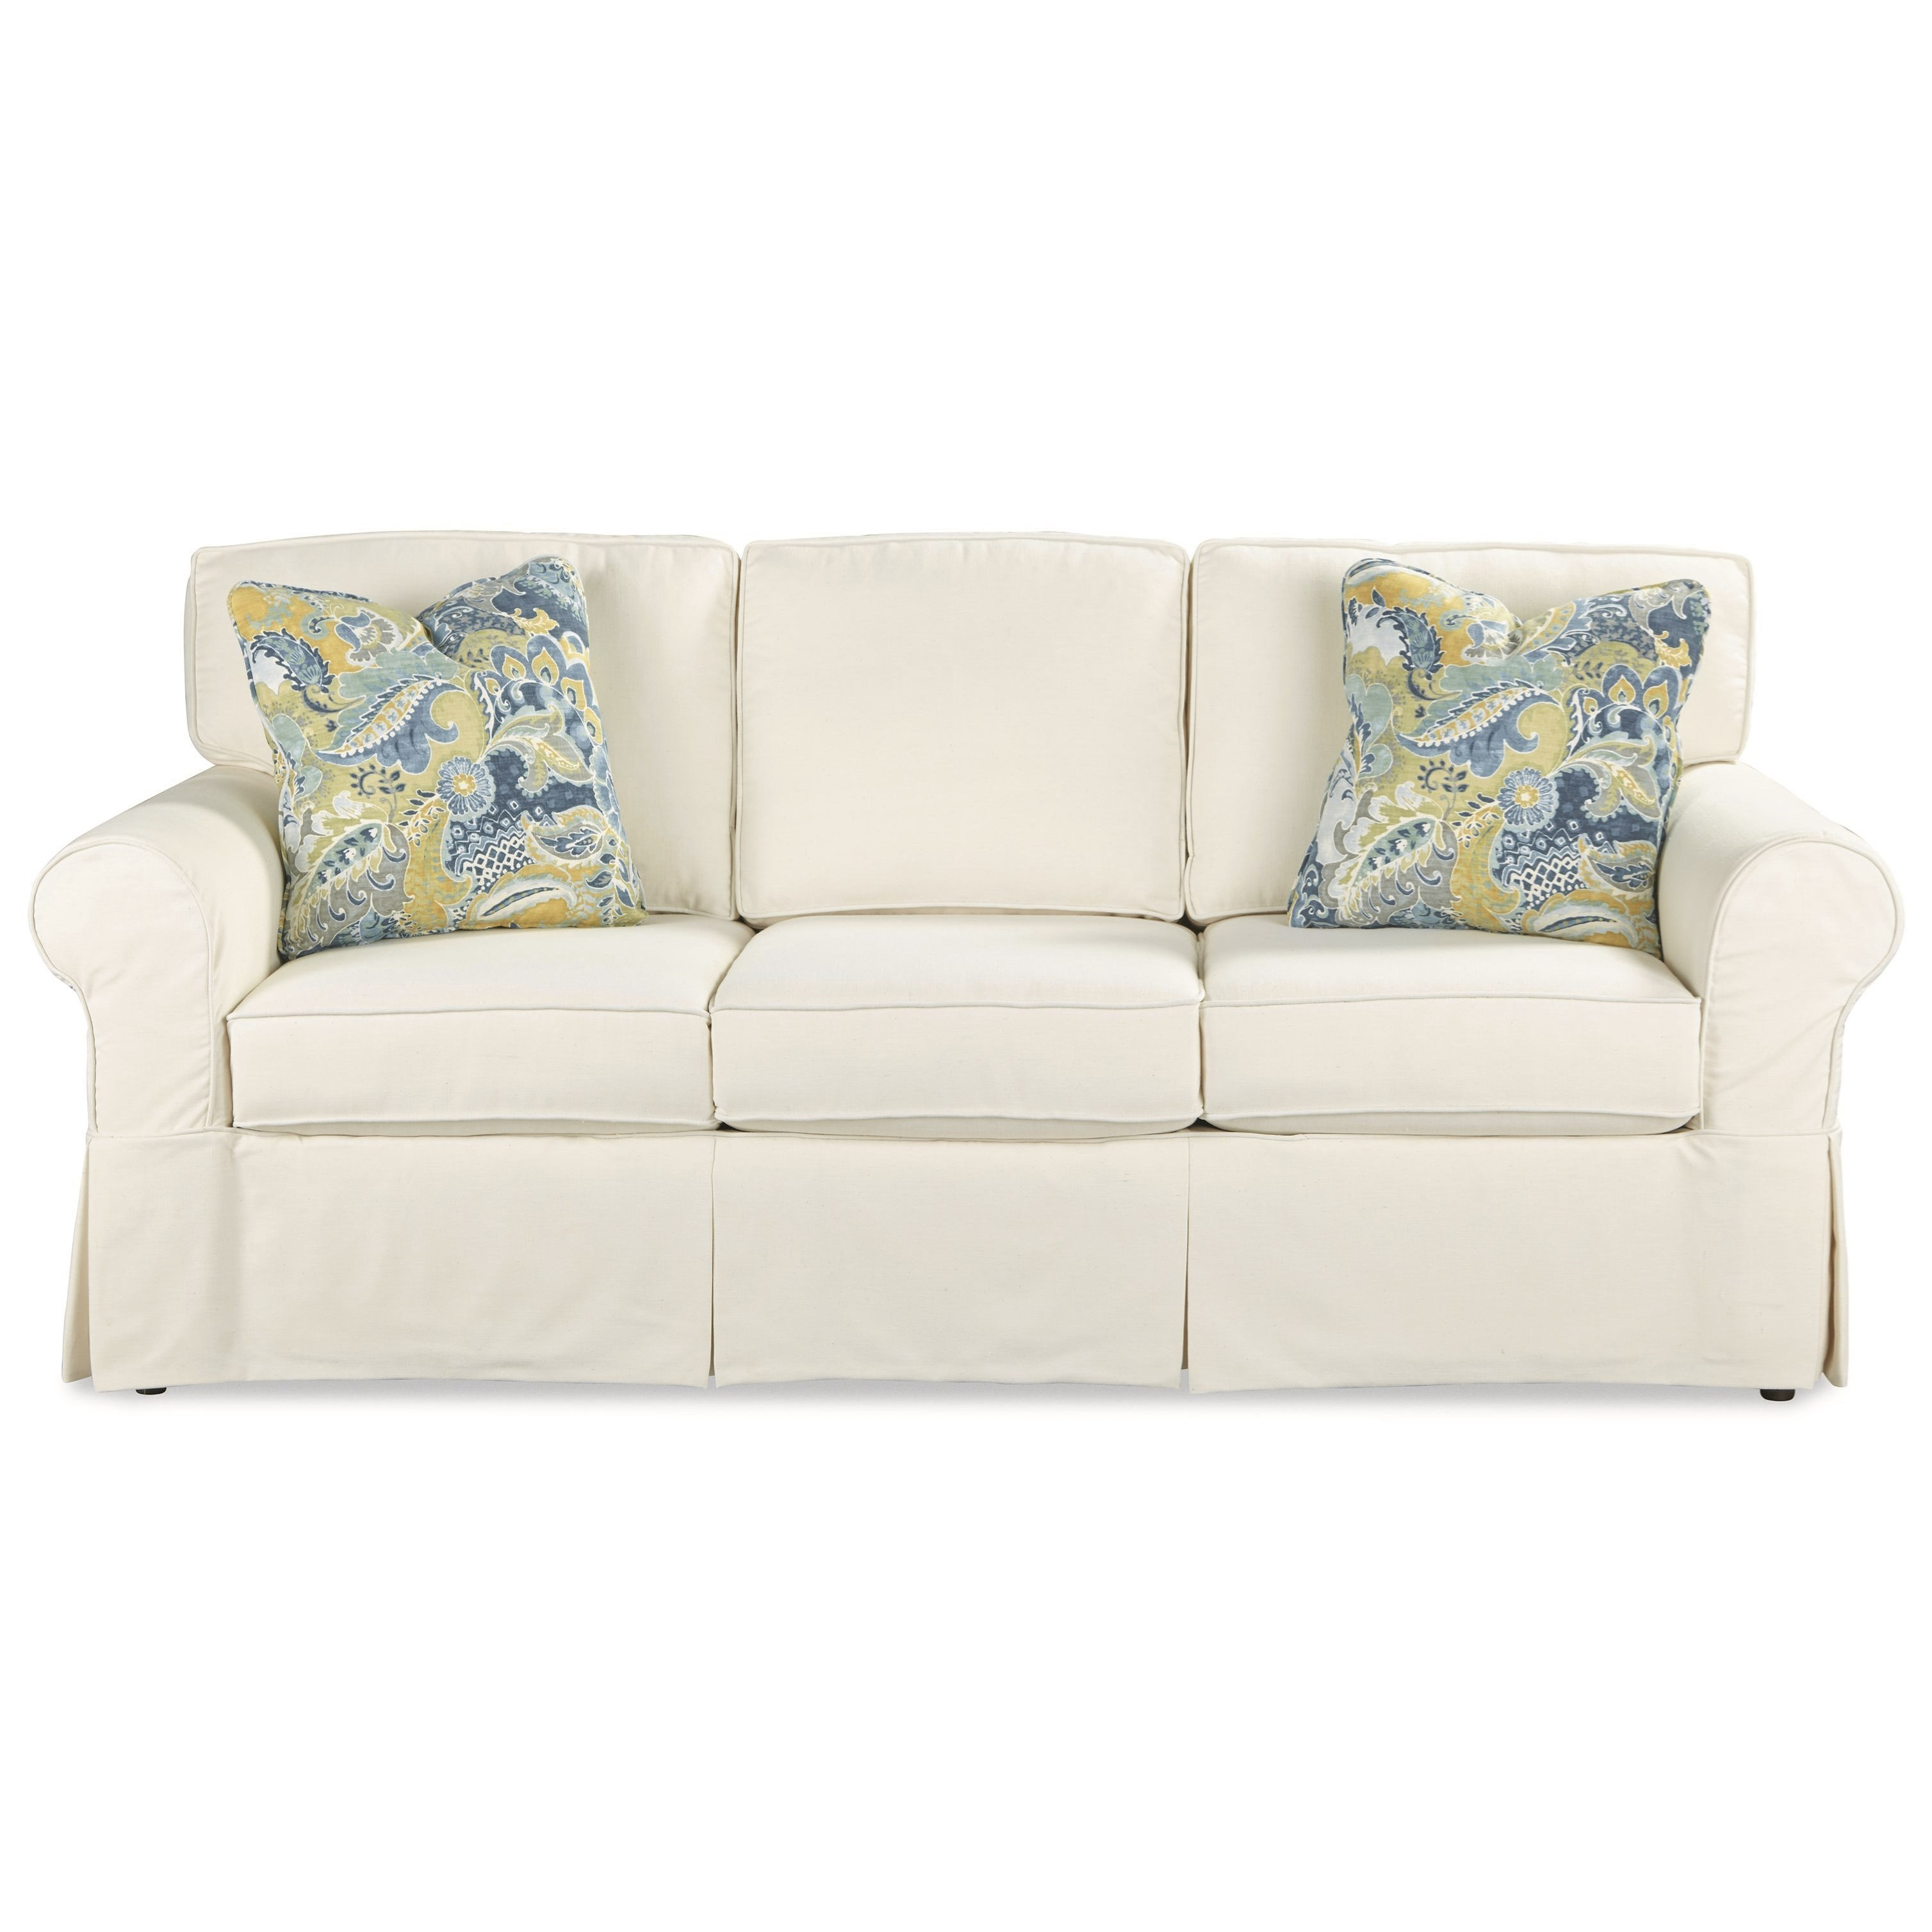 Casual Slipcover Sleeper Sofa with Queen Memory Foam Mattress